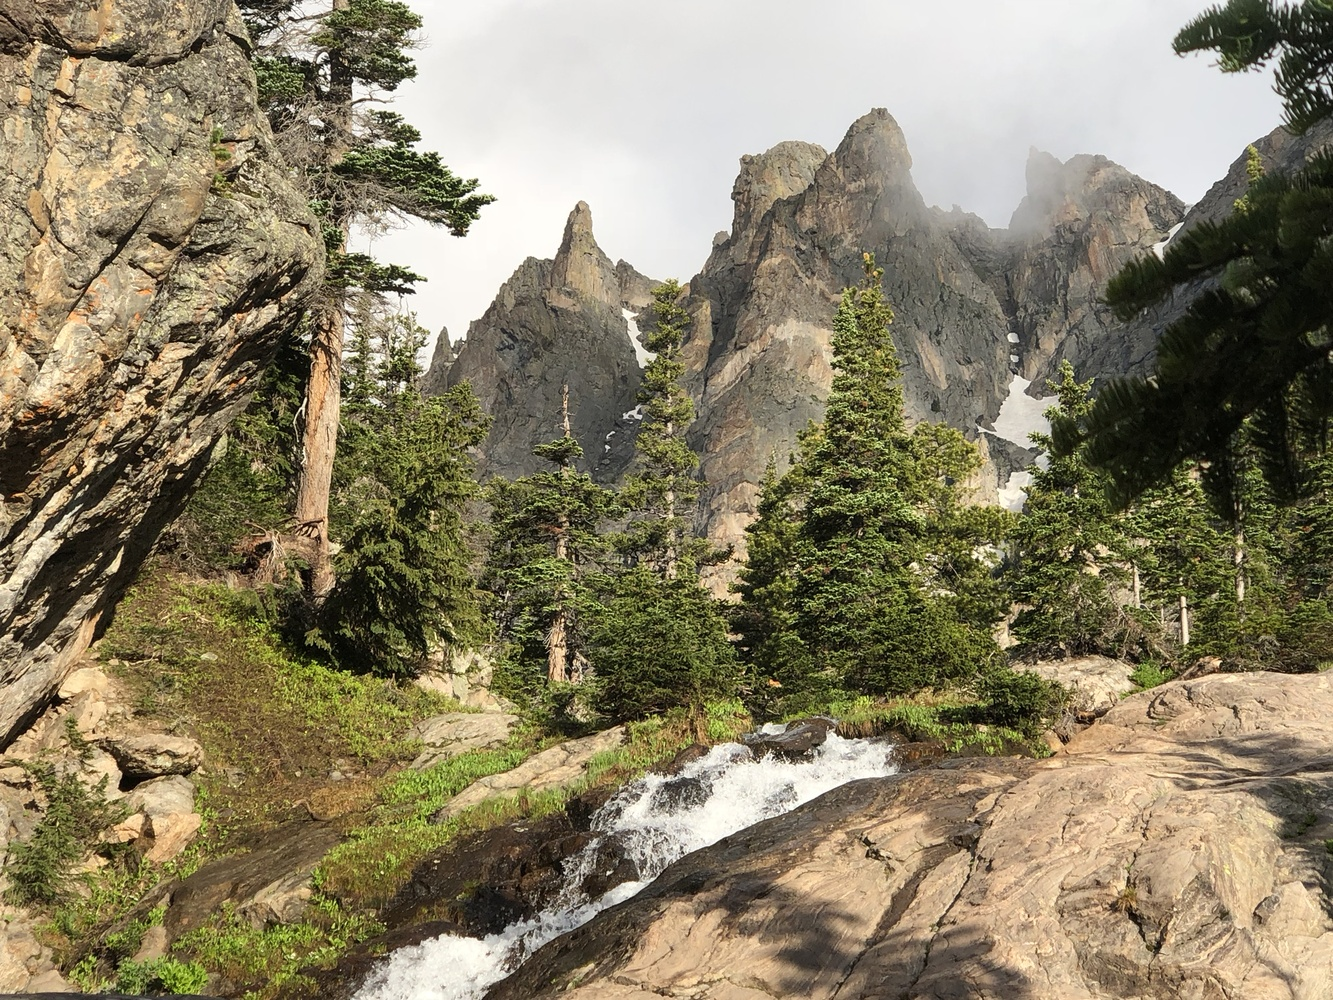 Forest Crags  by William Varner